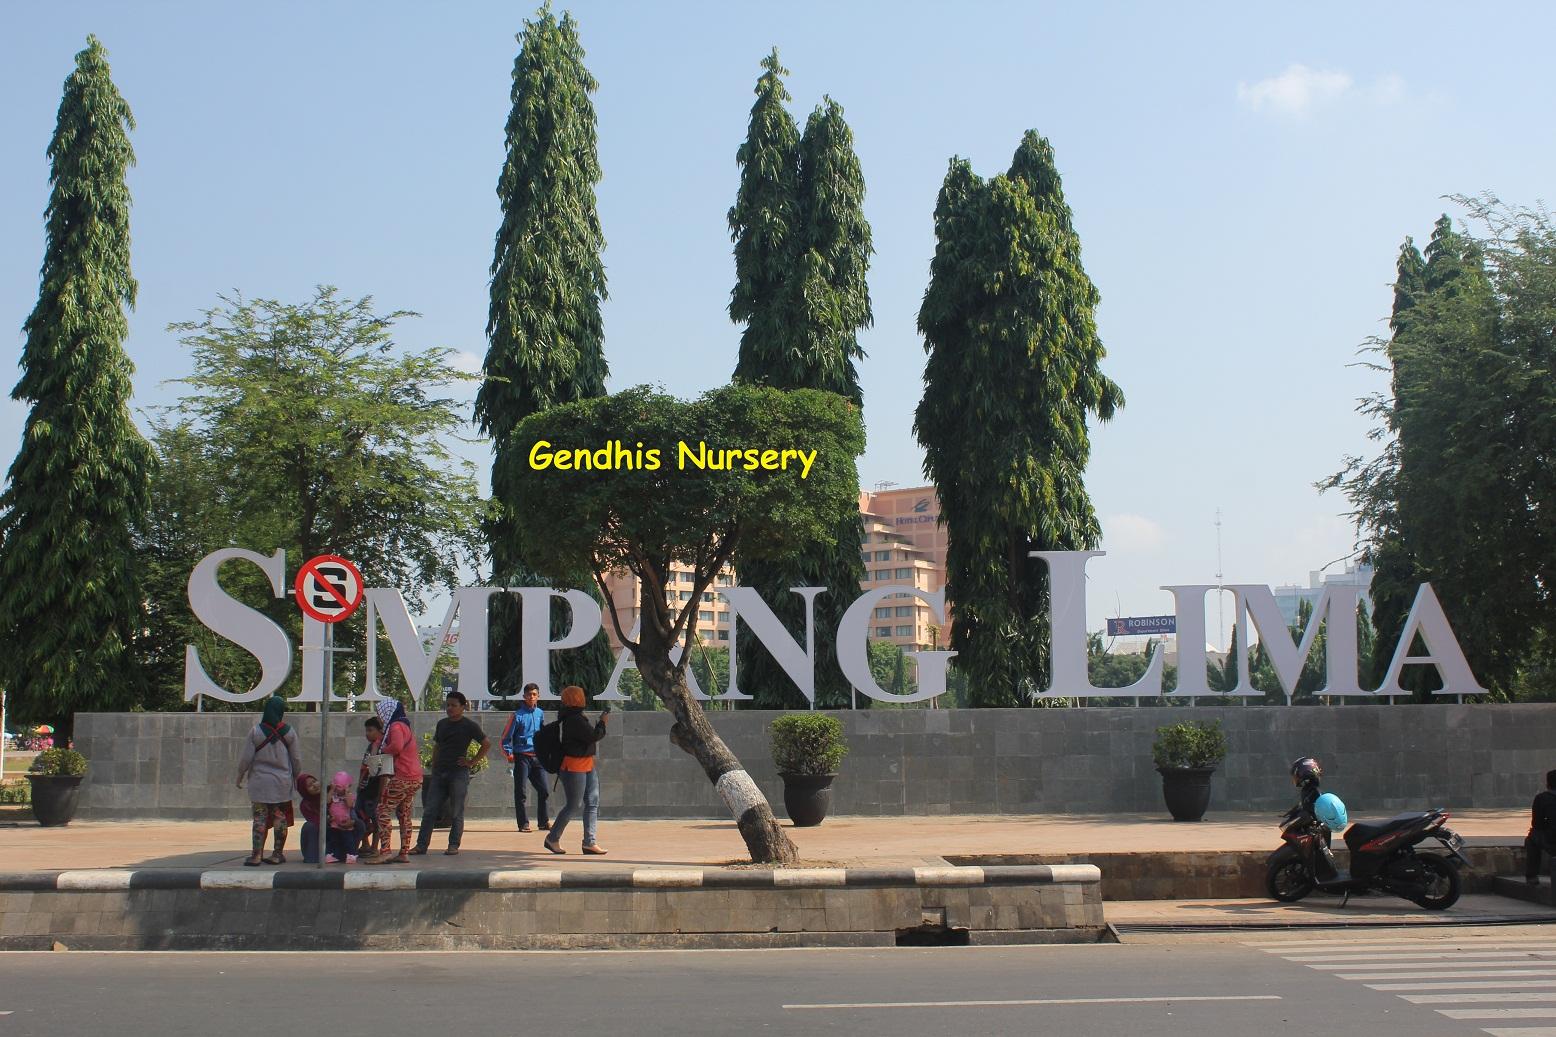 Wahanawisata Com Simpang Lima Semarang Ikon Kota Semarang